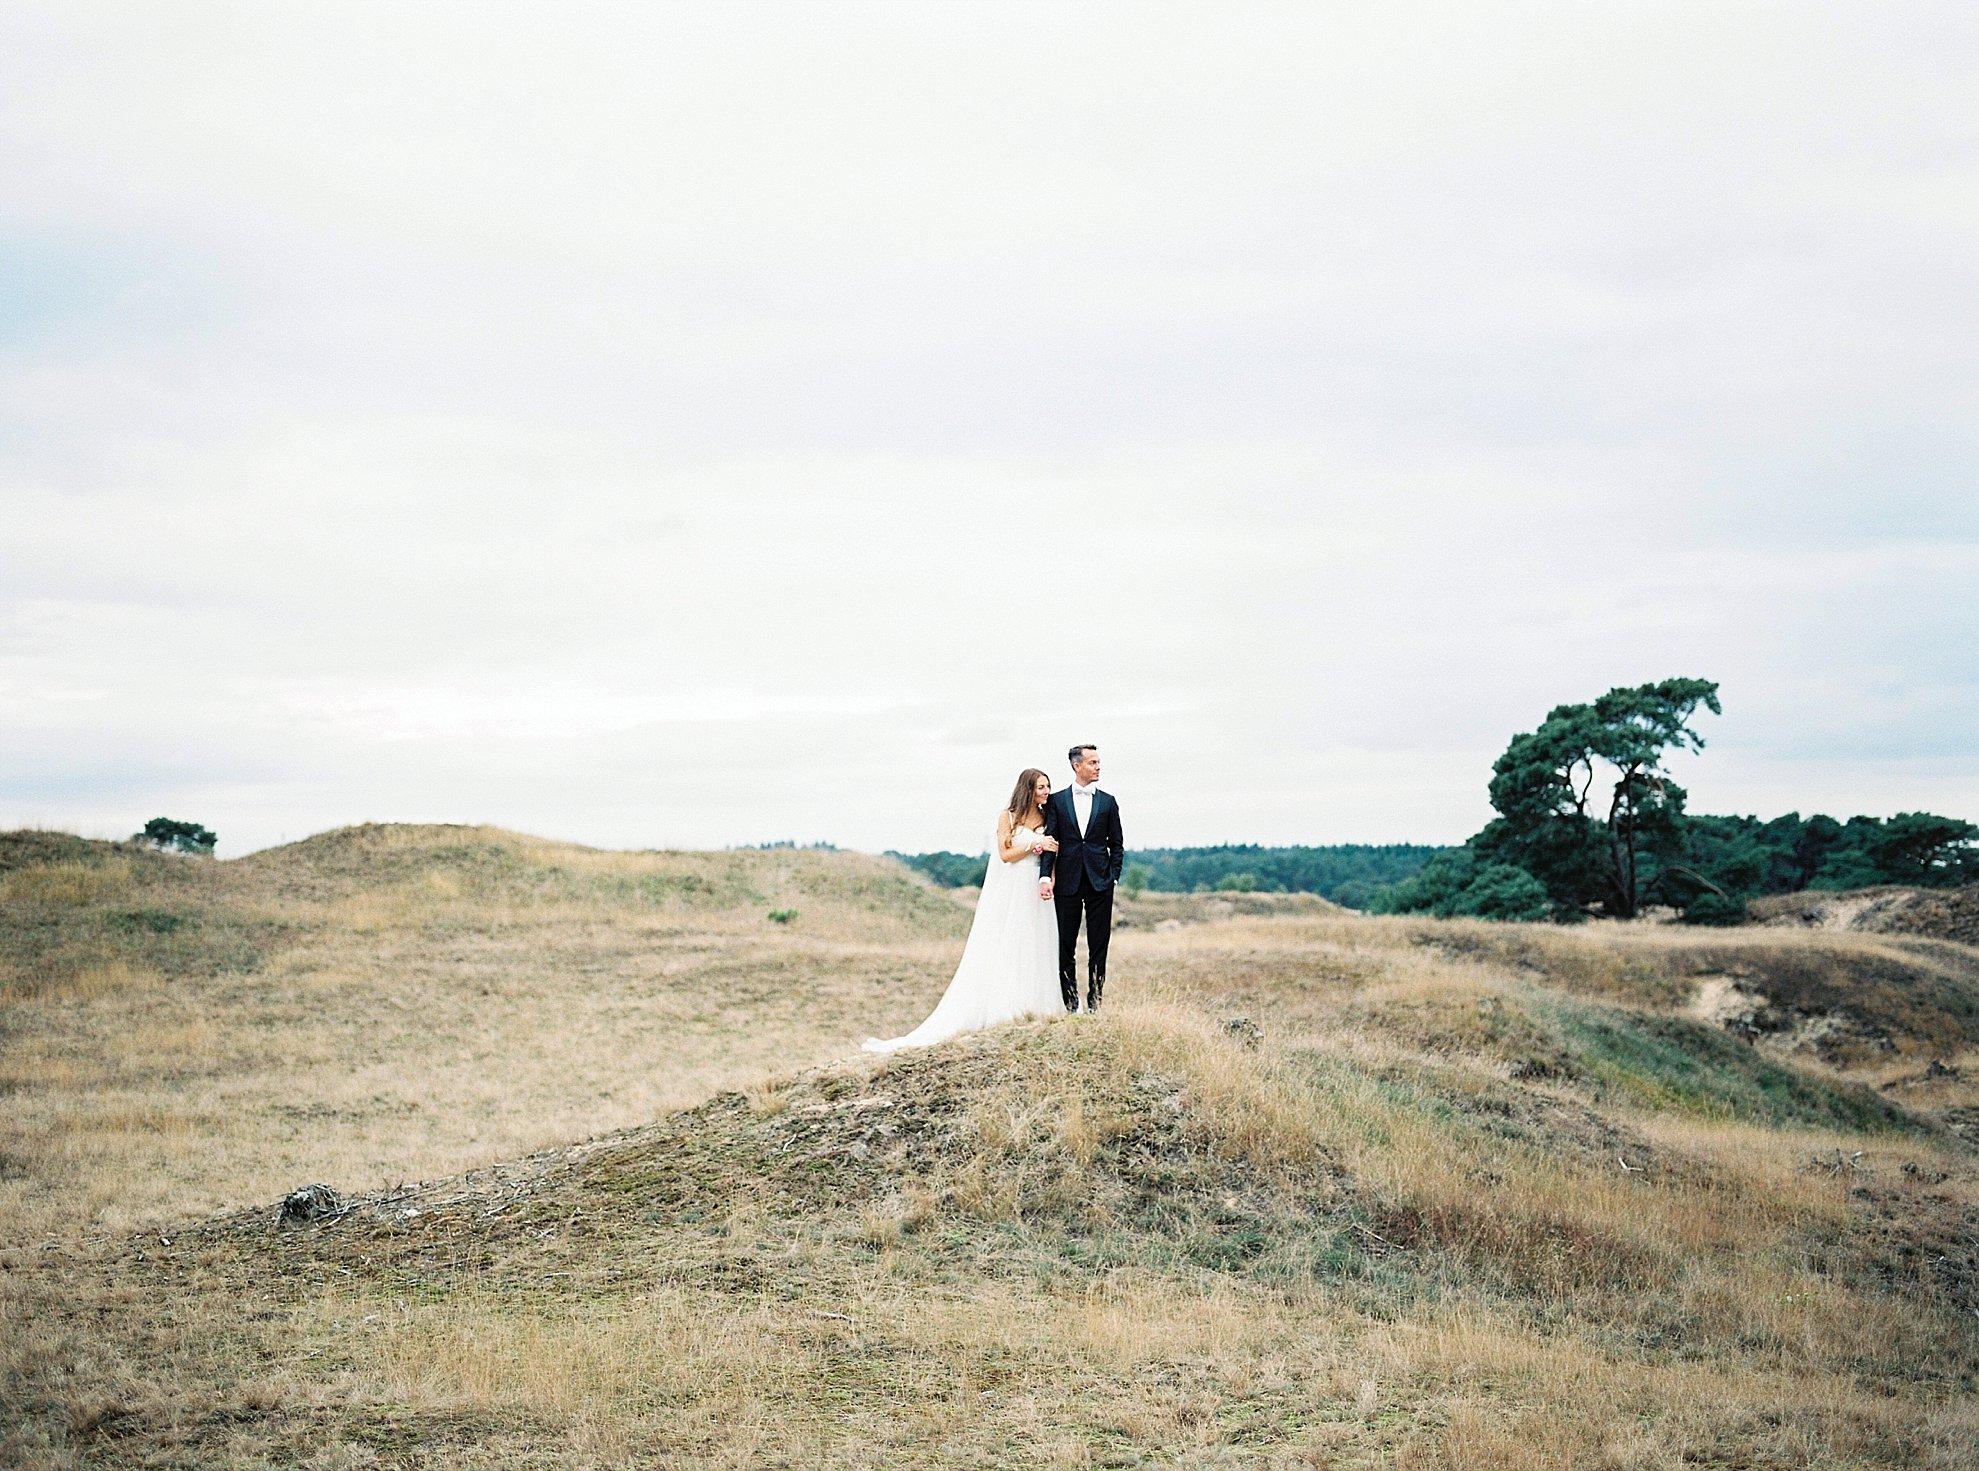 Amanda-Drost-photography-fine-art-nederland-couple-shoot-editorial_0008.jpg